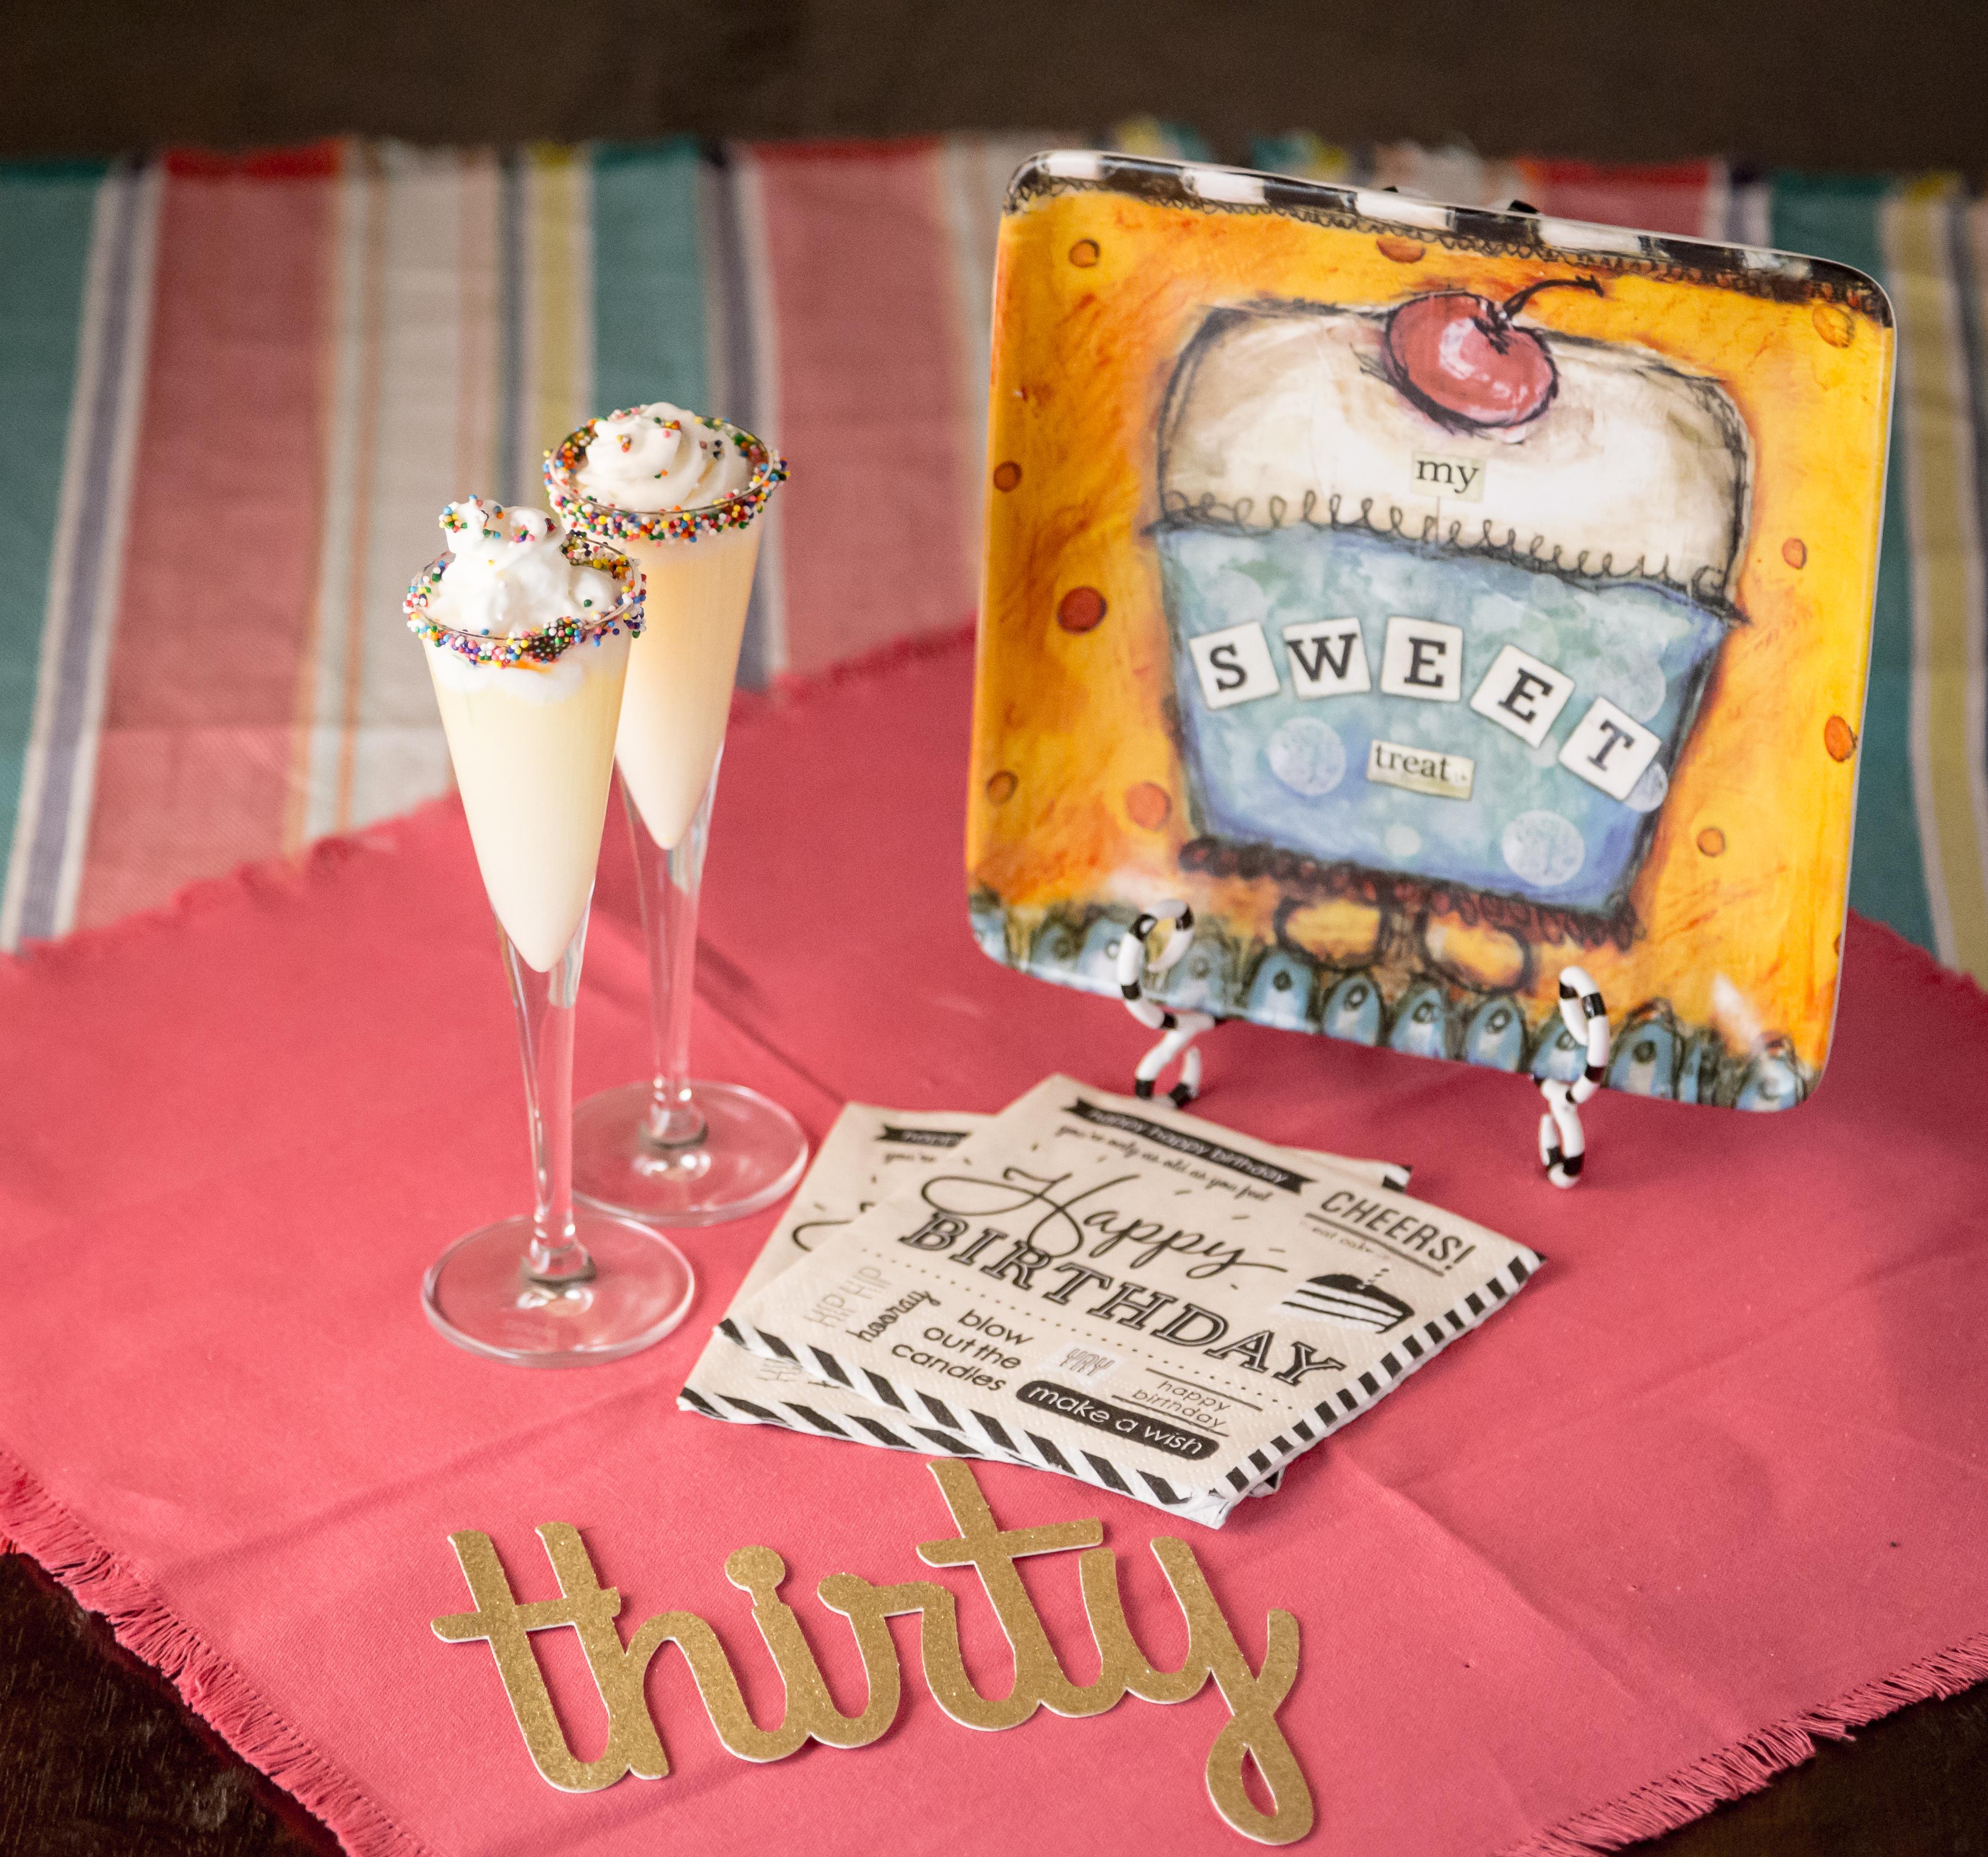 Phenomenal 30Th Birthday Cake Shots Sweet Tea Sweetie Funny Birthday Cards Online Alyptdamsfinfo